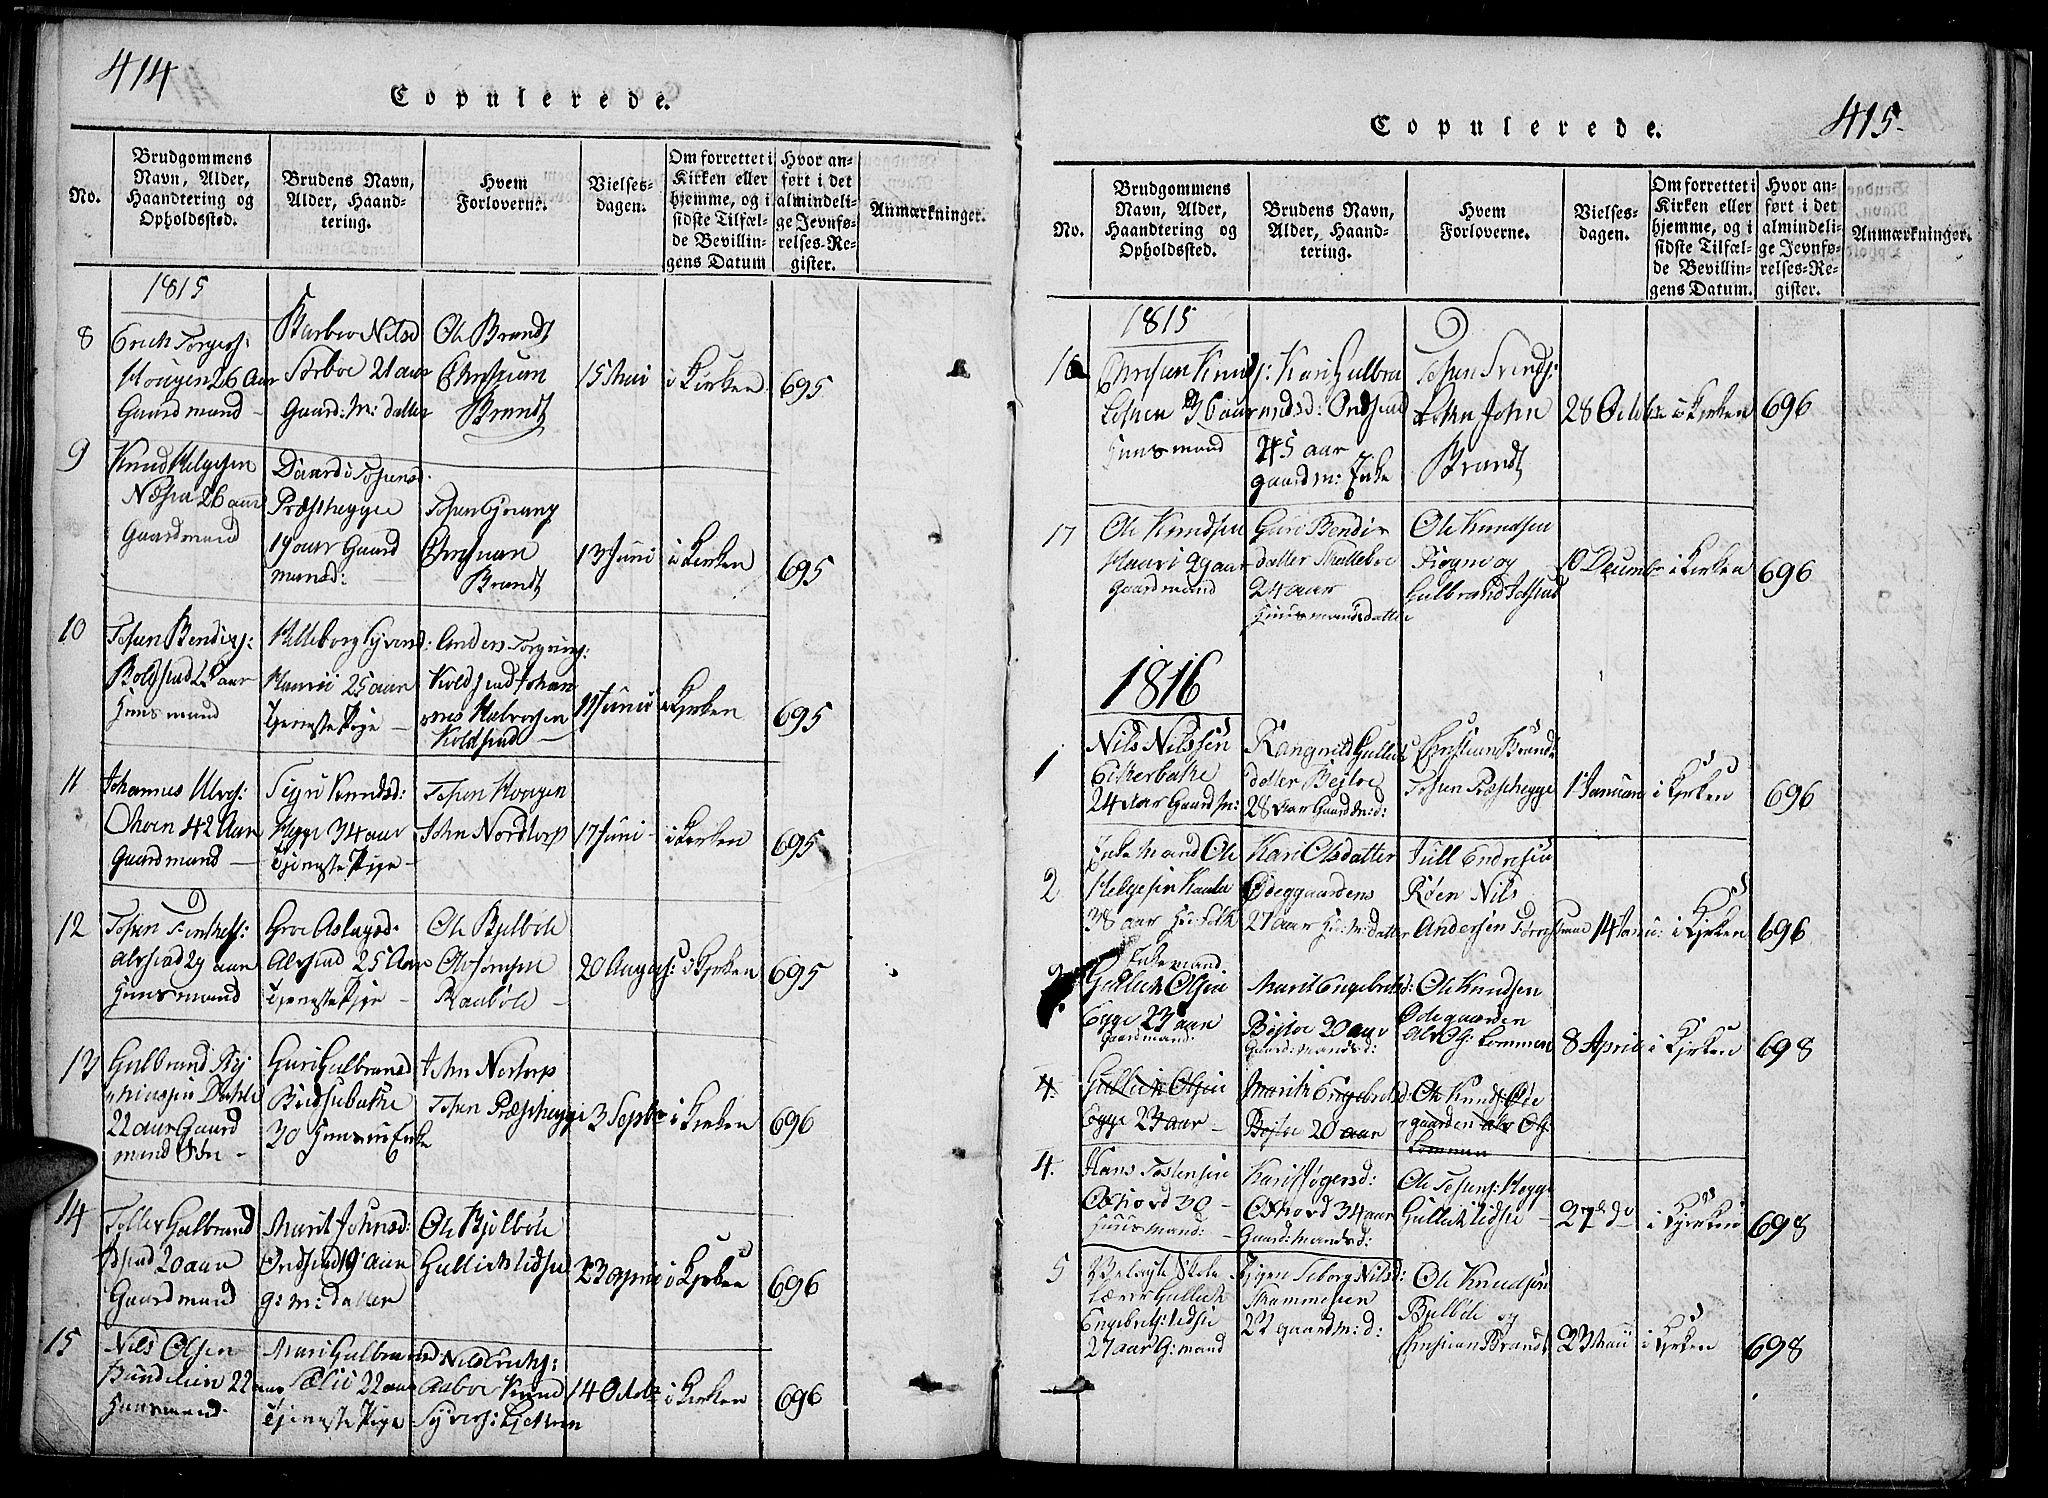 SAH, Slidre prestekontor, Klokkerbok nr. 2, 1814-1839, s. 414-415